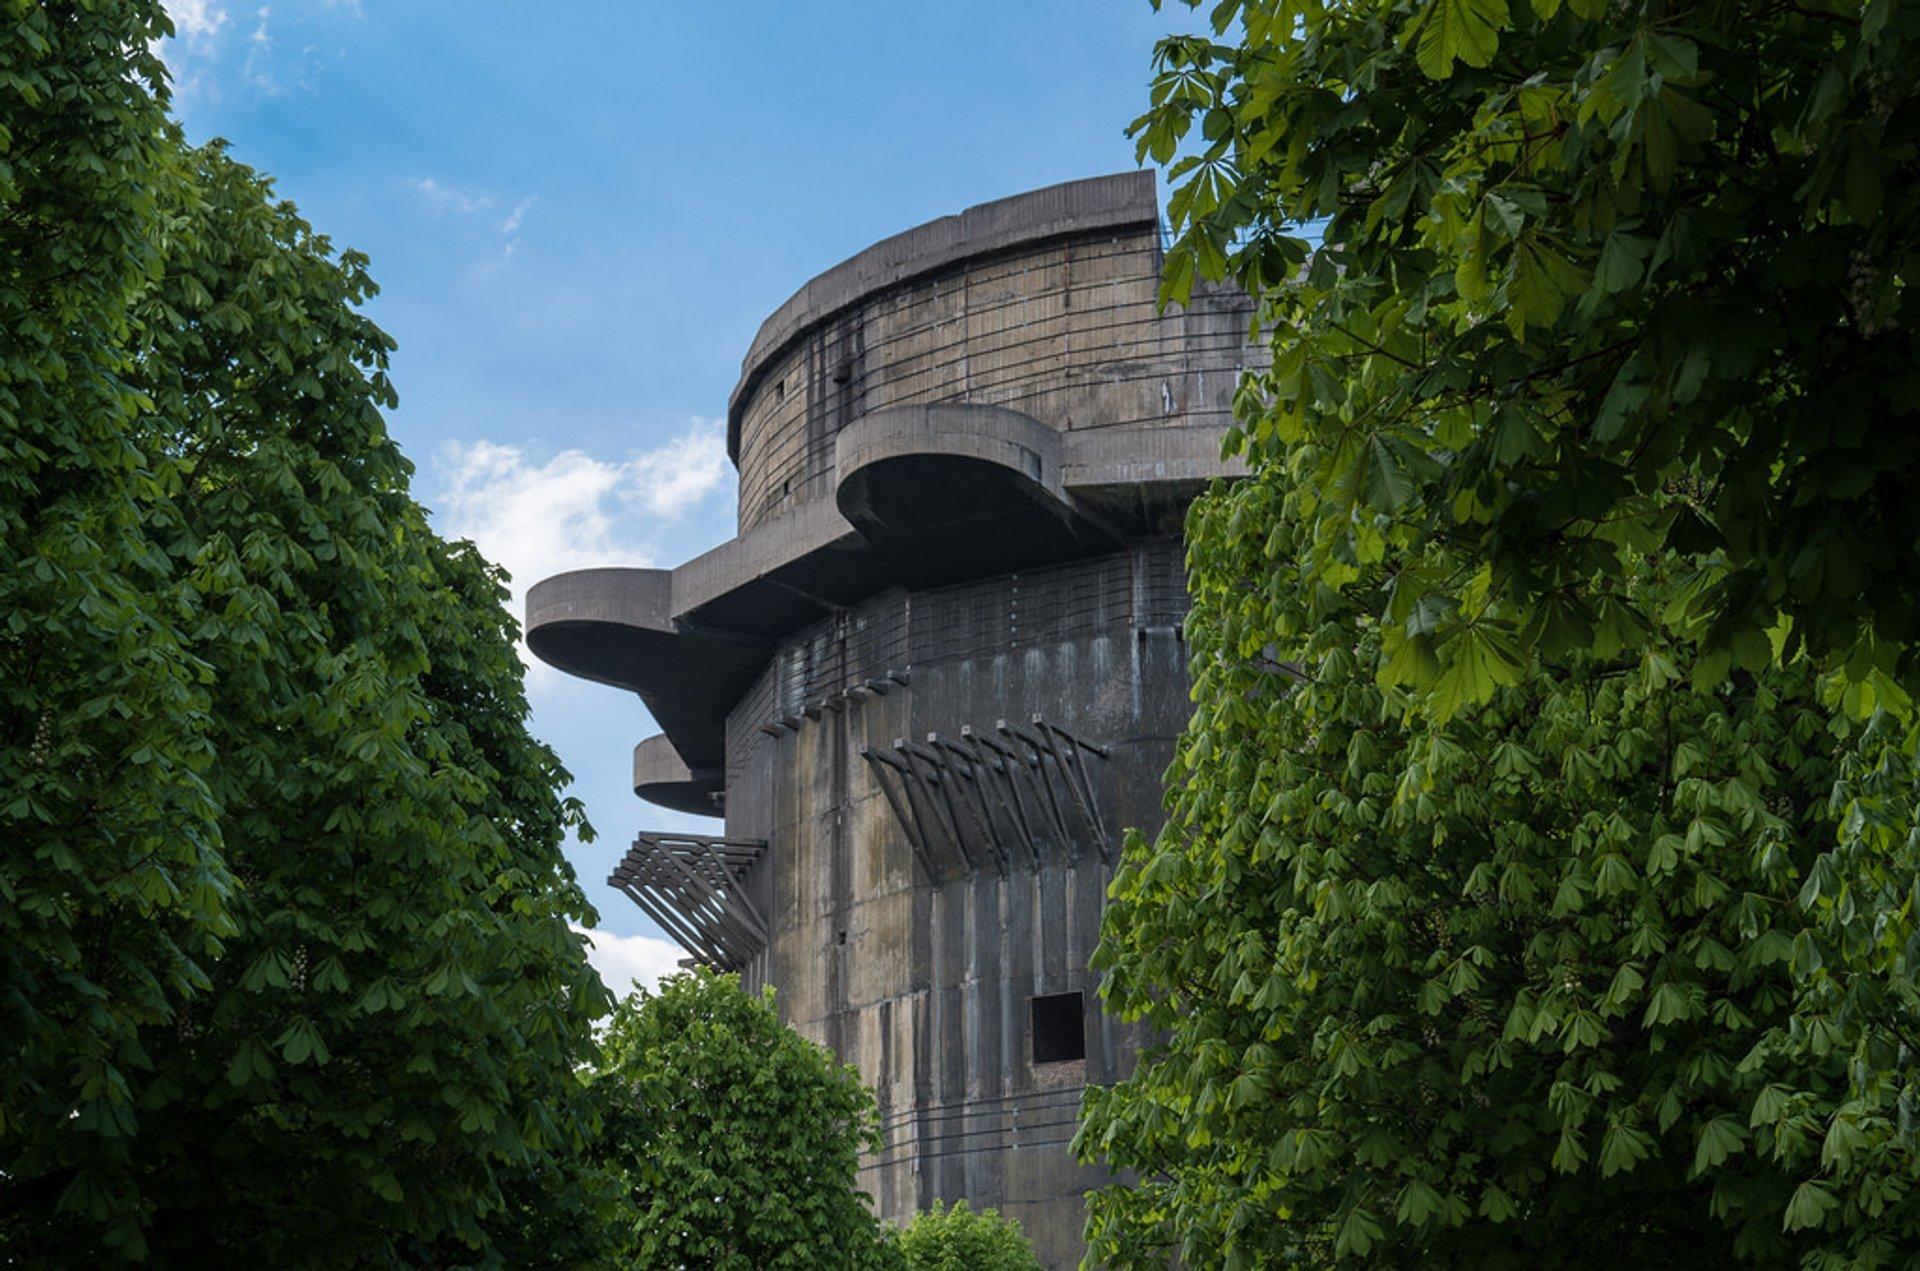 Flak Towers (Flaktürme) in Vienna - Best Season 2019